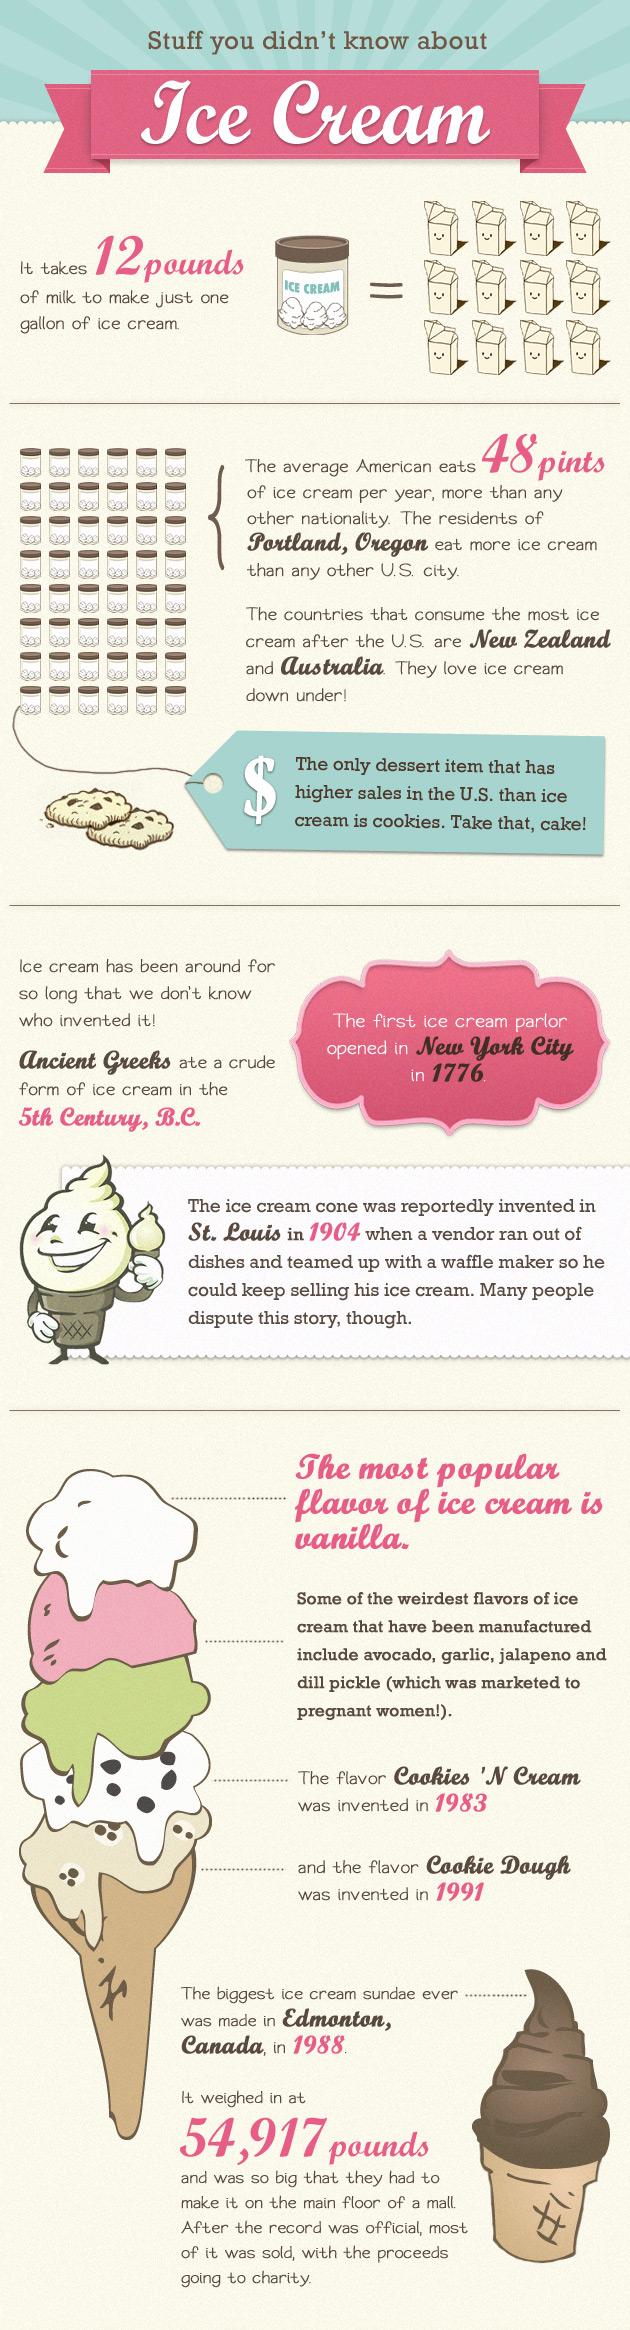 Ice Cream Industry Statistics